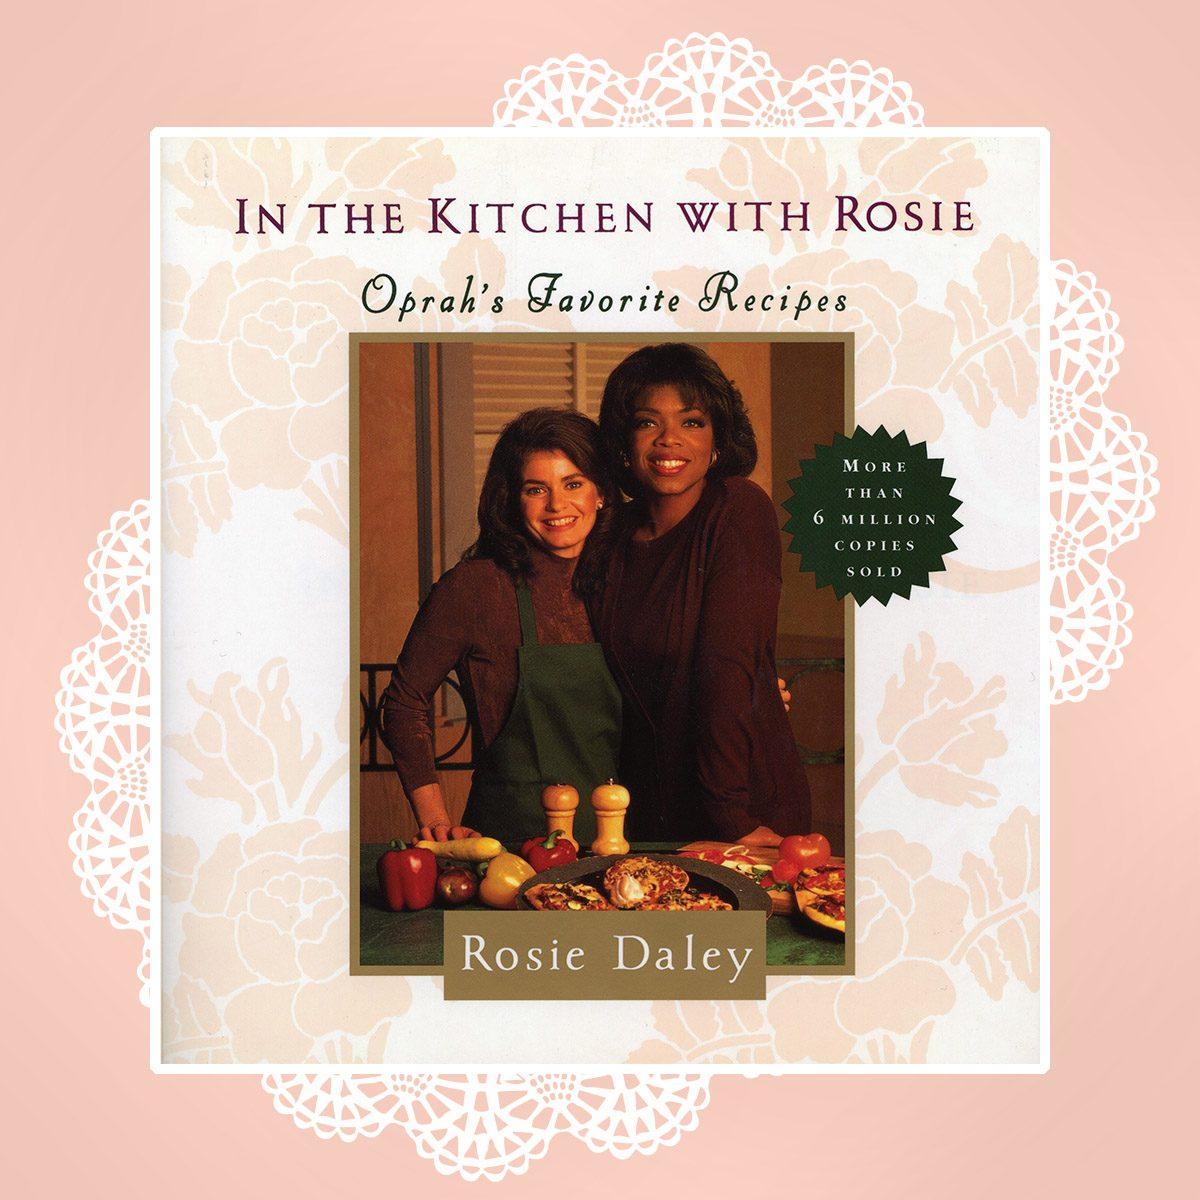 In the Kitchen with Rosie- Oprah's Favorite Recipes